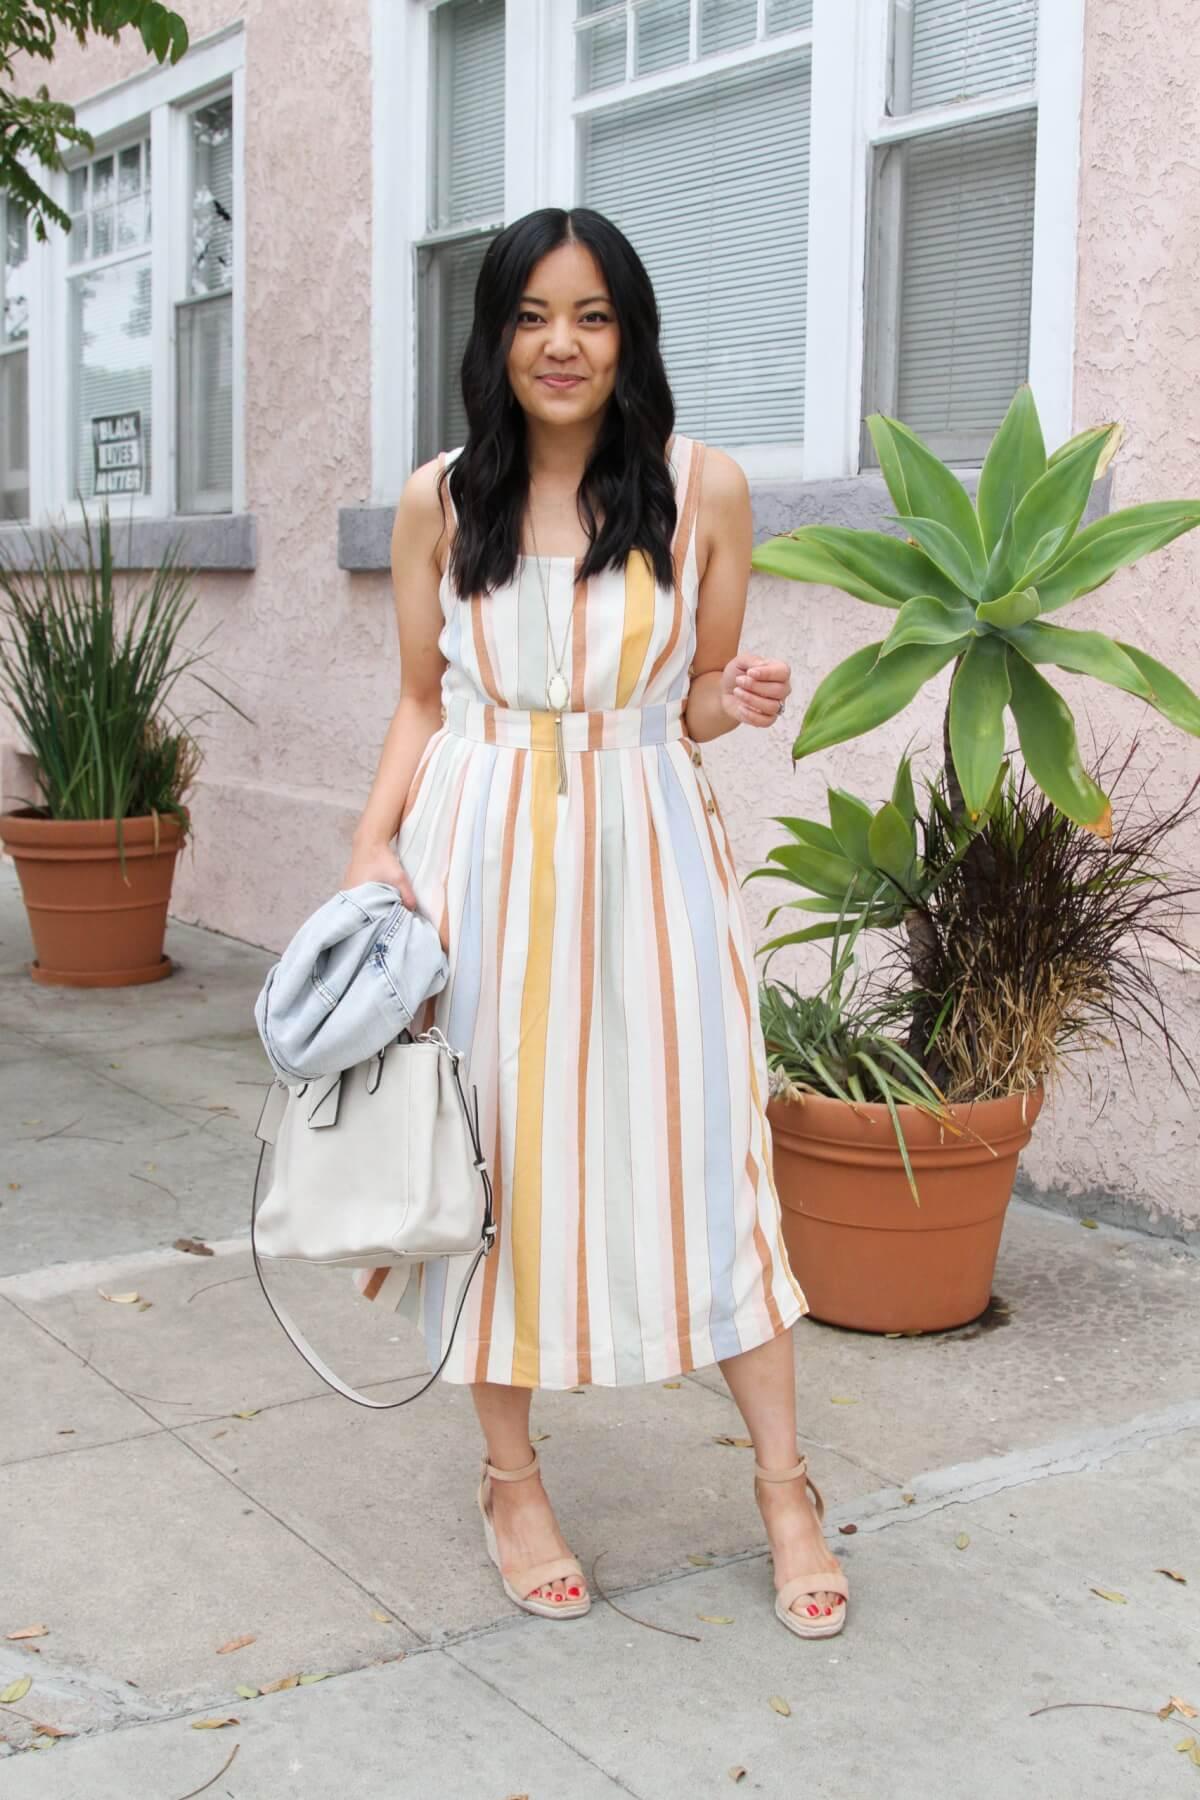 Dressy Outfit: pastel striped midi dress + nude wedges + pendant necklace + denim jacket + white bag